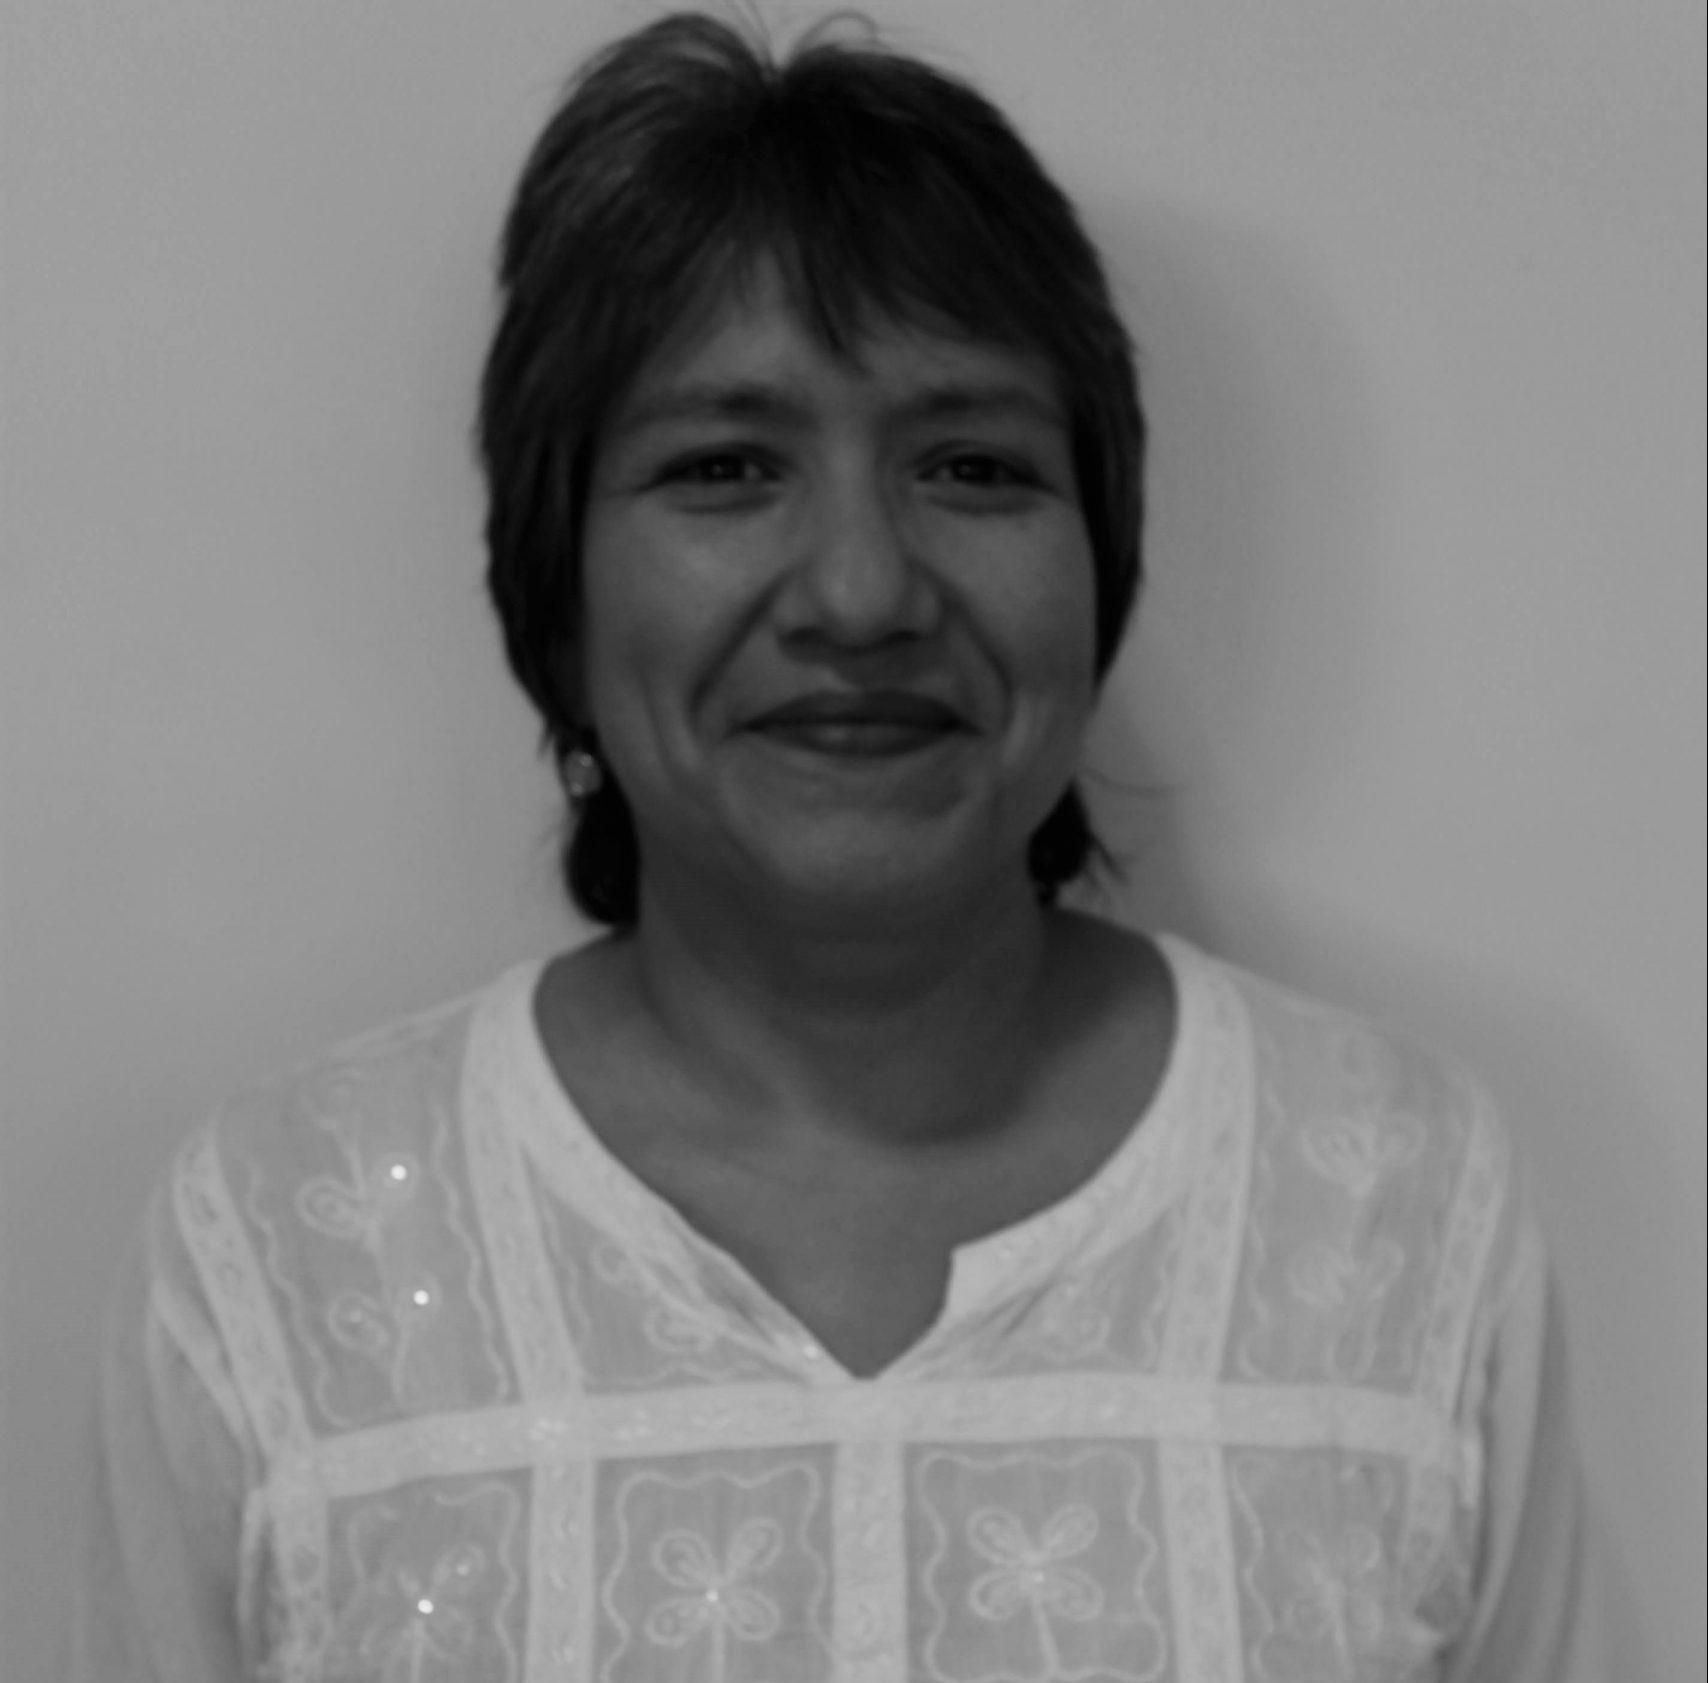 Alibel Pizarro